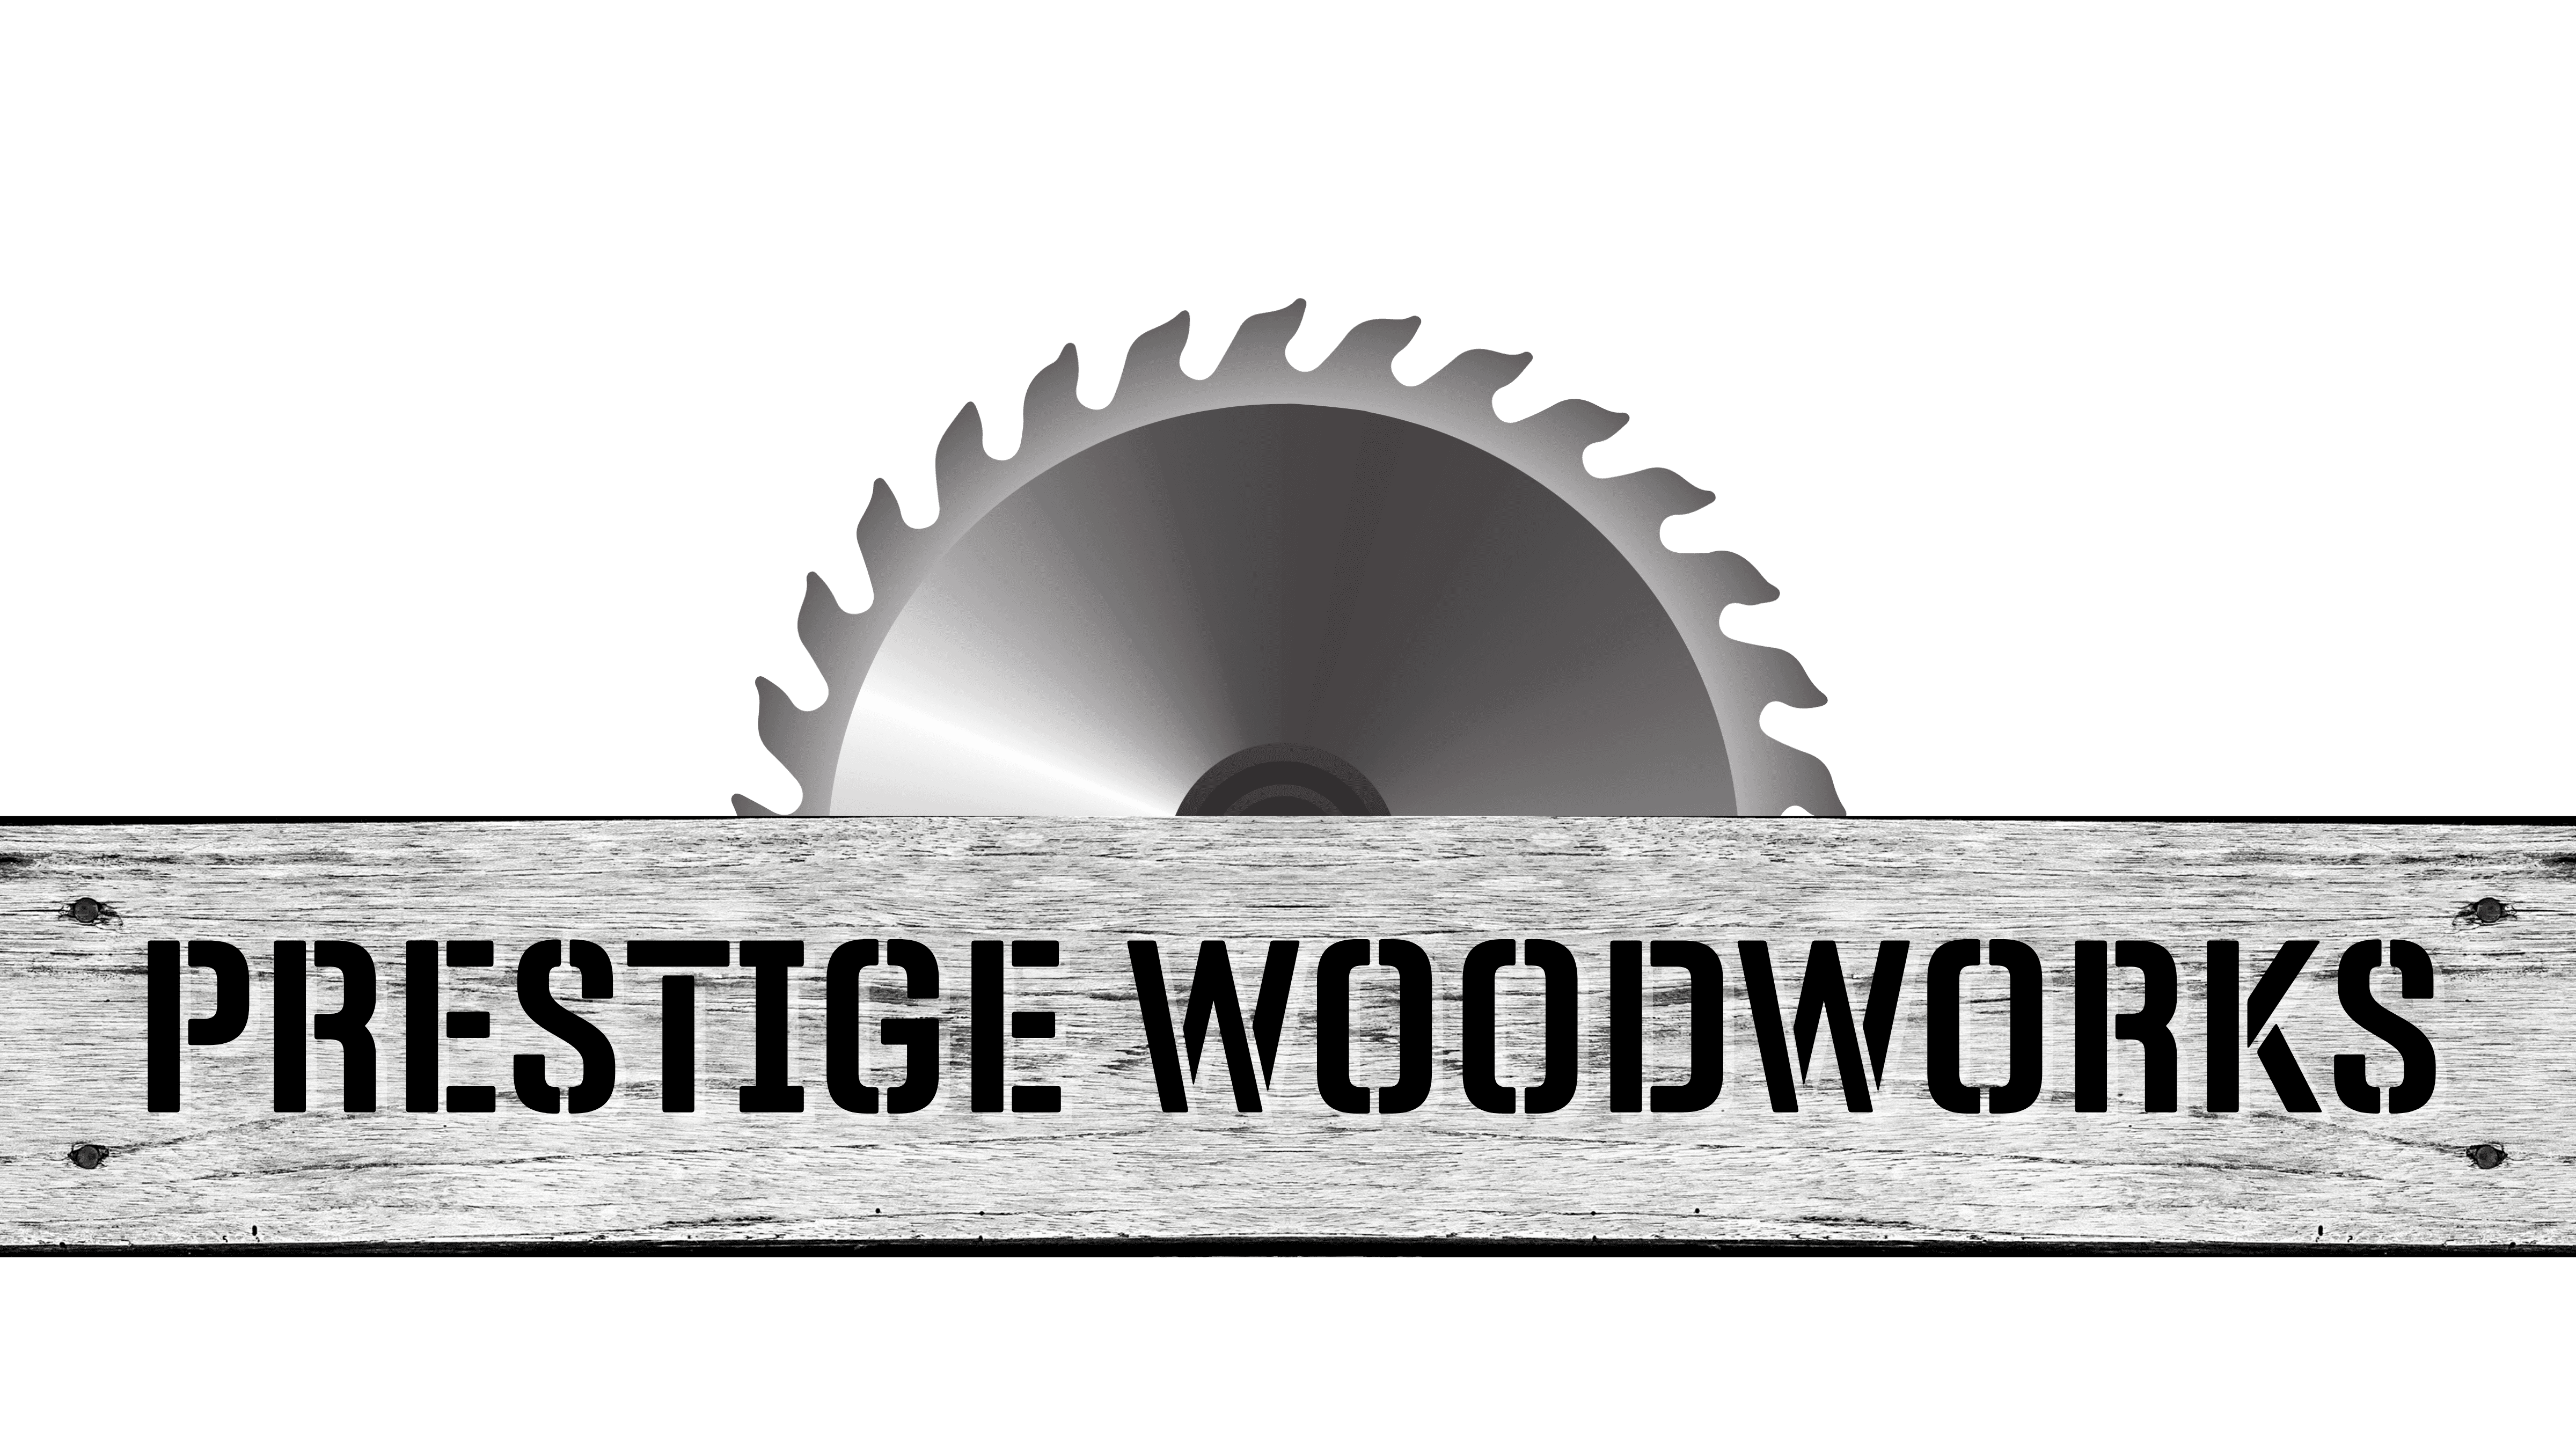 Prestige Woodworks